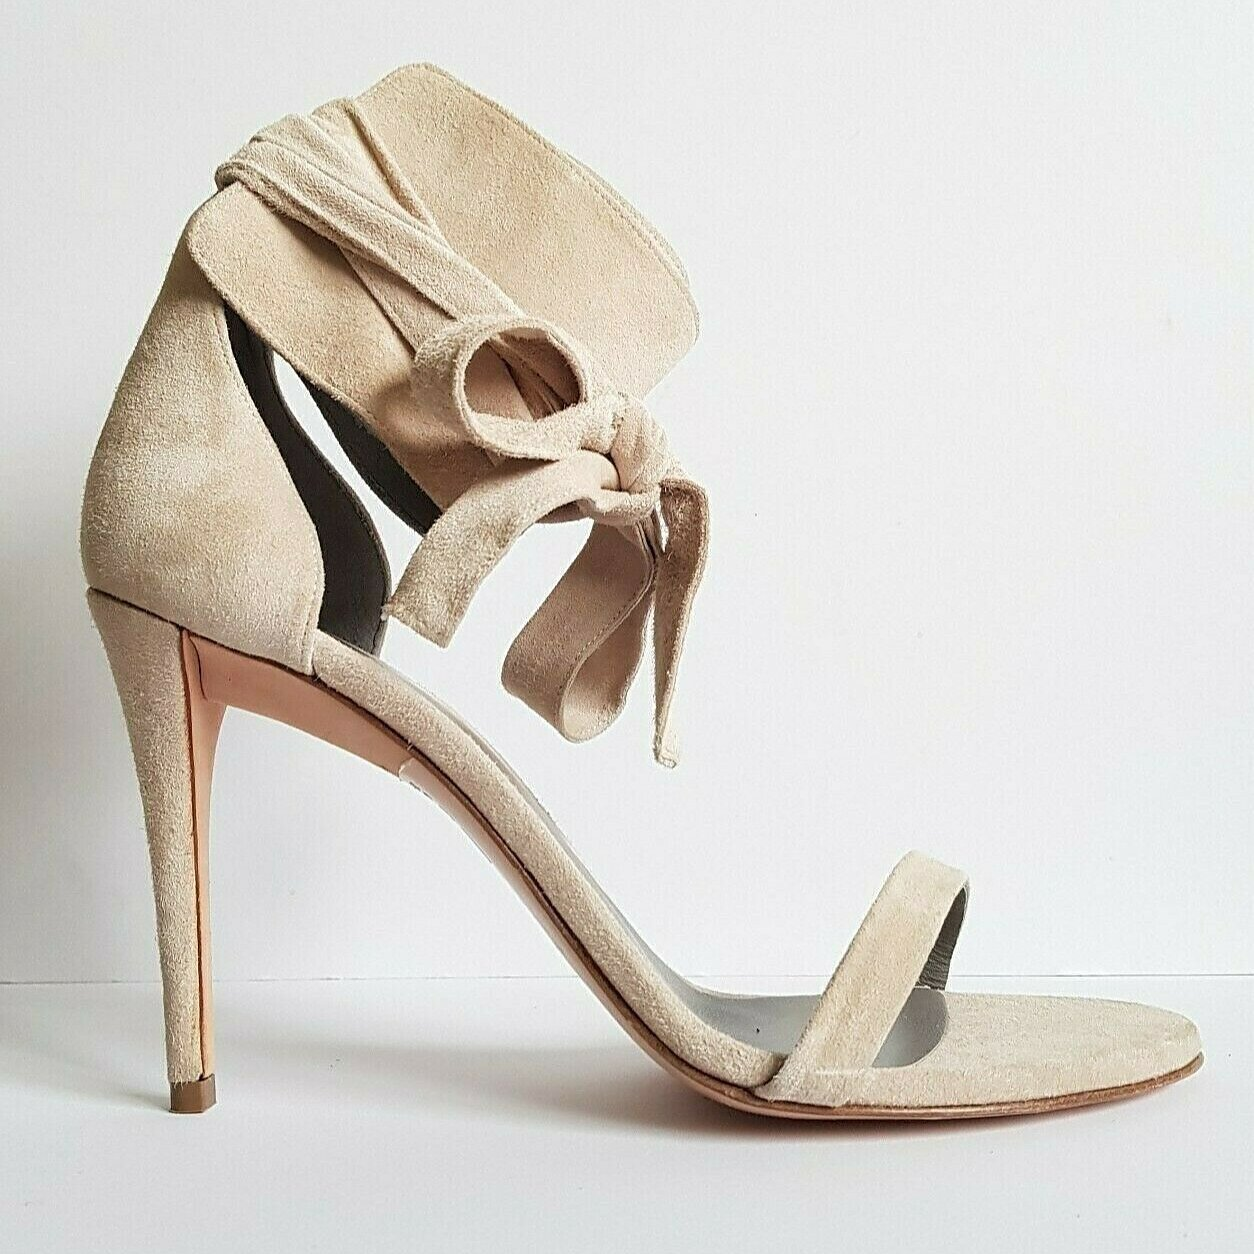 Gina Nude Suede Ankle Tie Heels